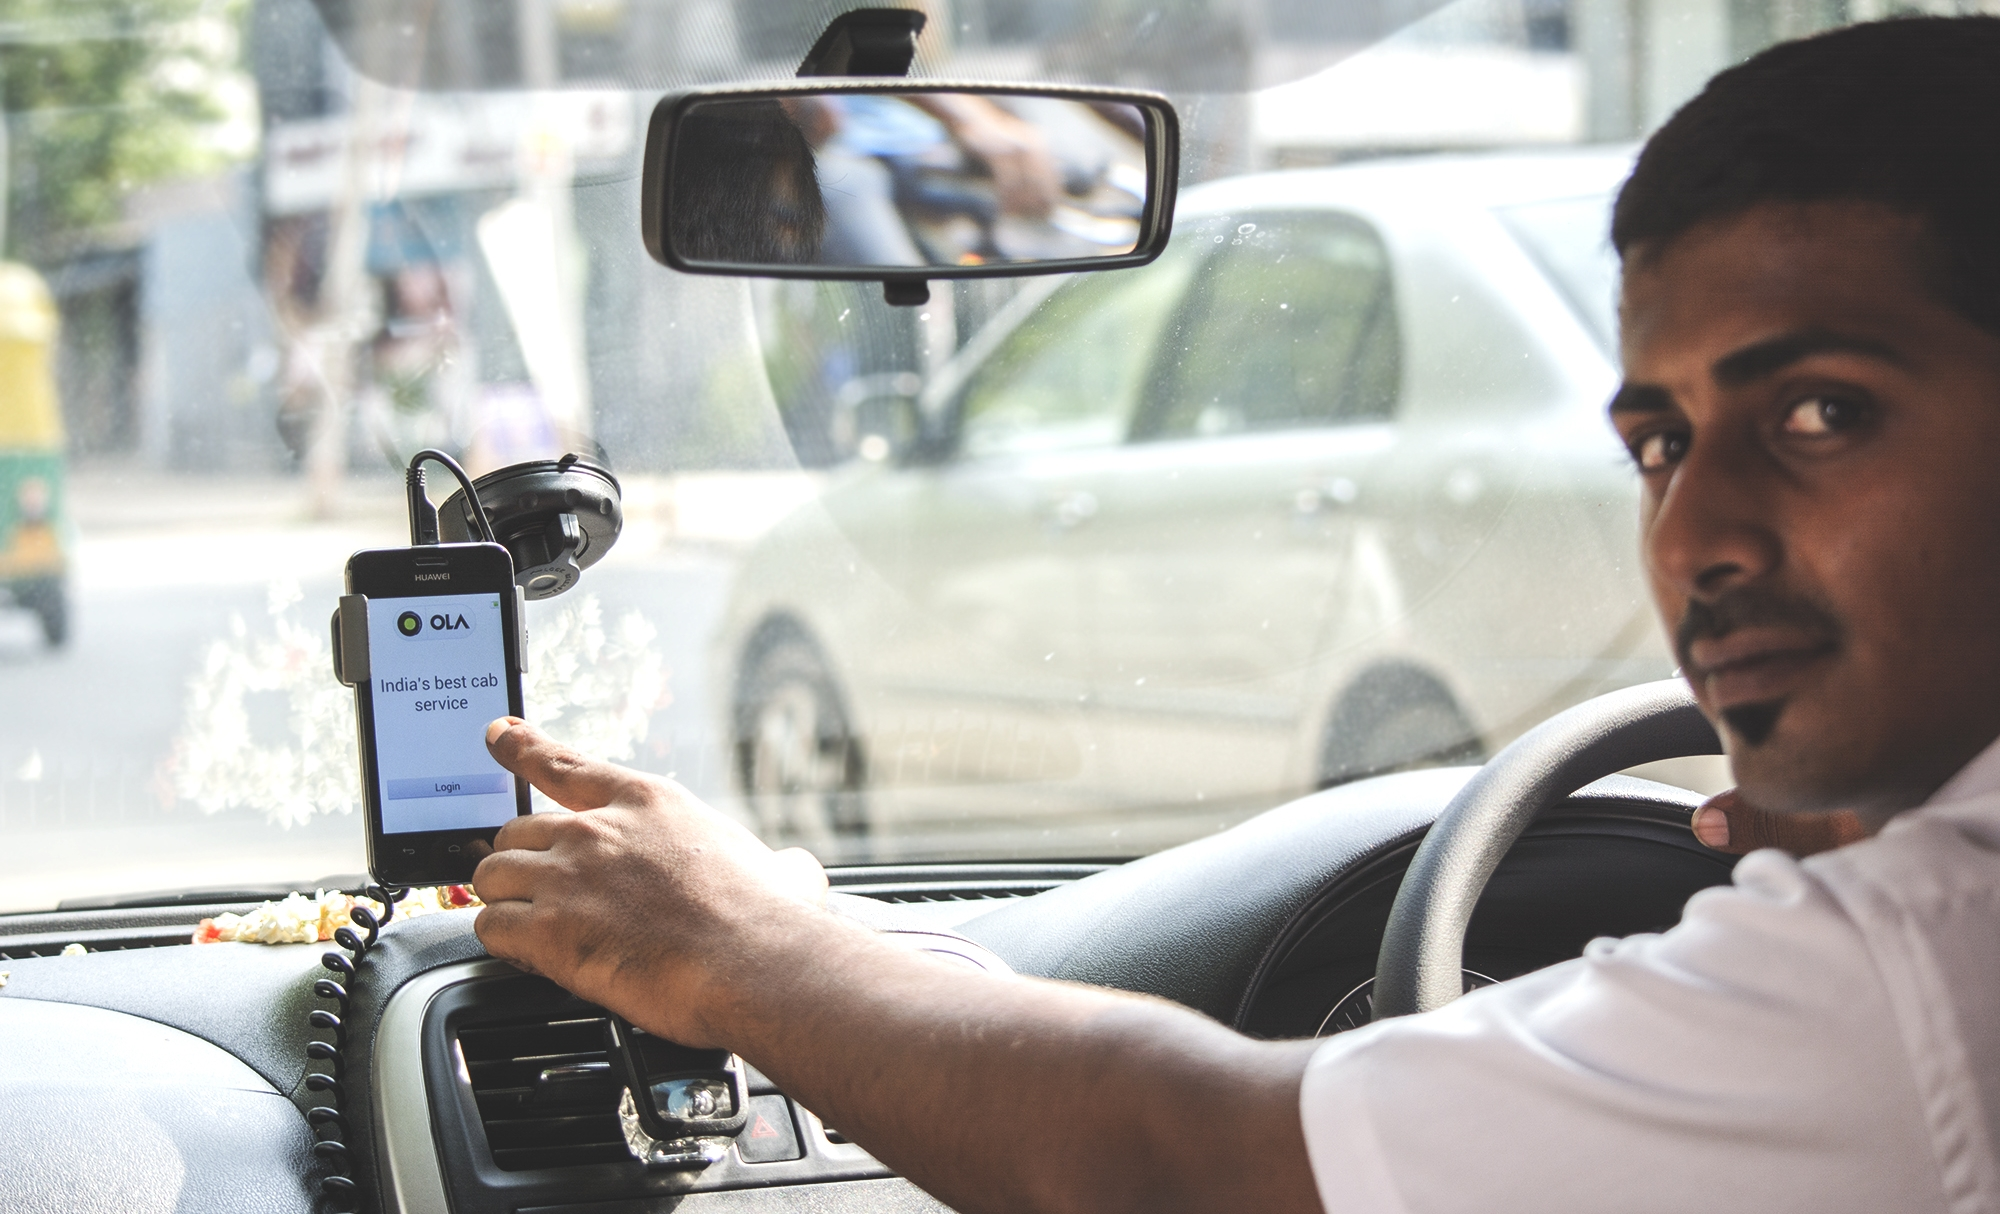 ola cabs net worth